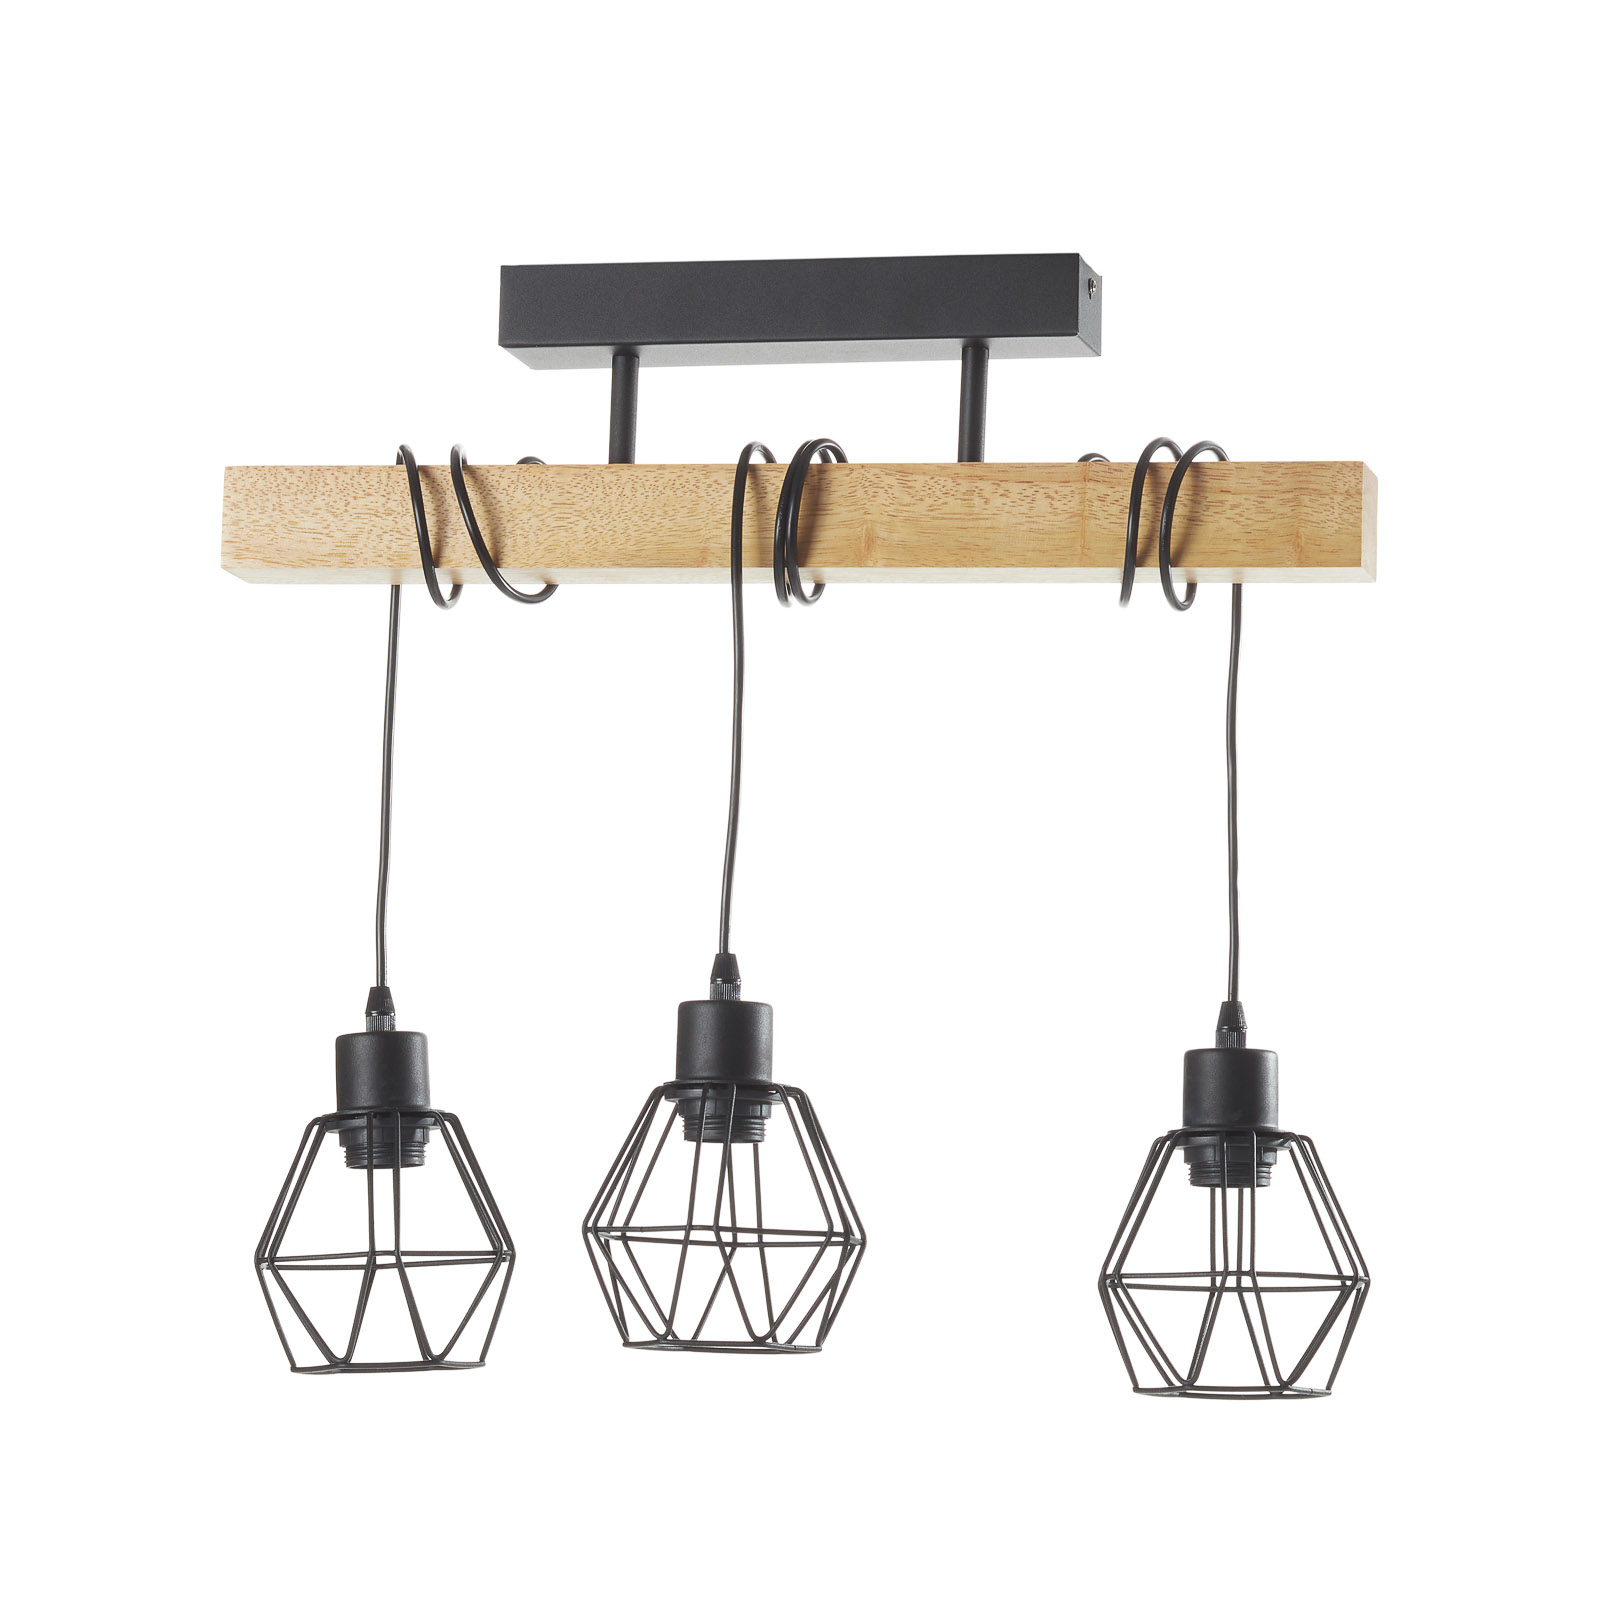 Plafondlamp Townshend 5 met 3 kooikappen